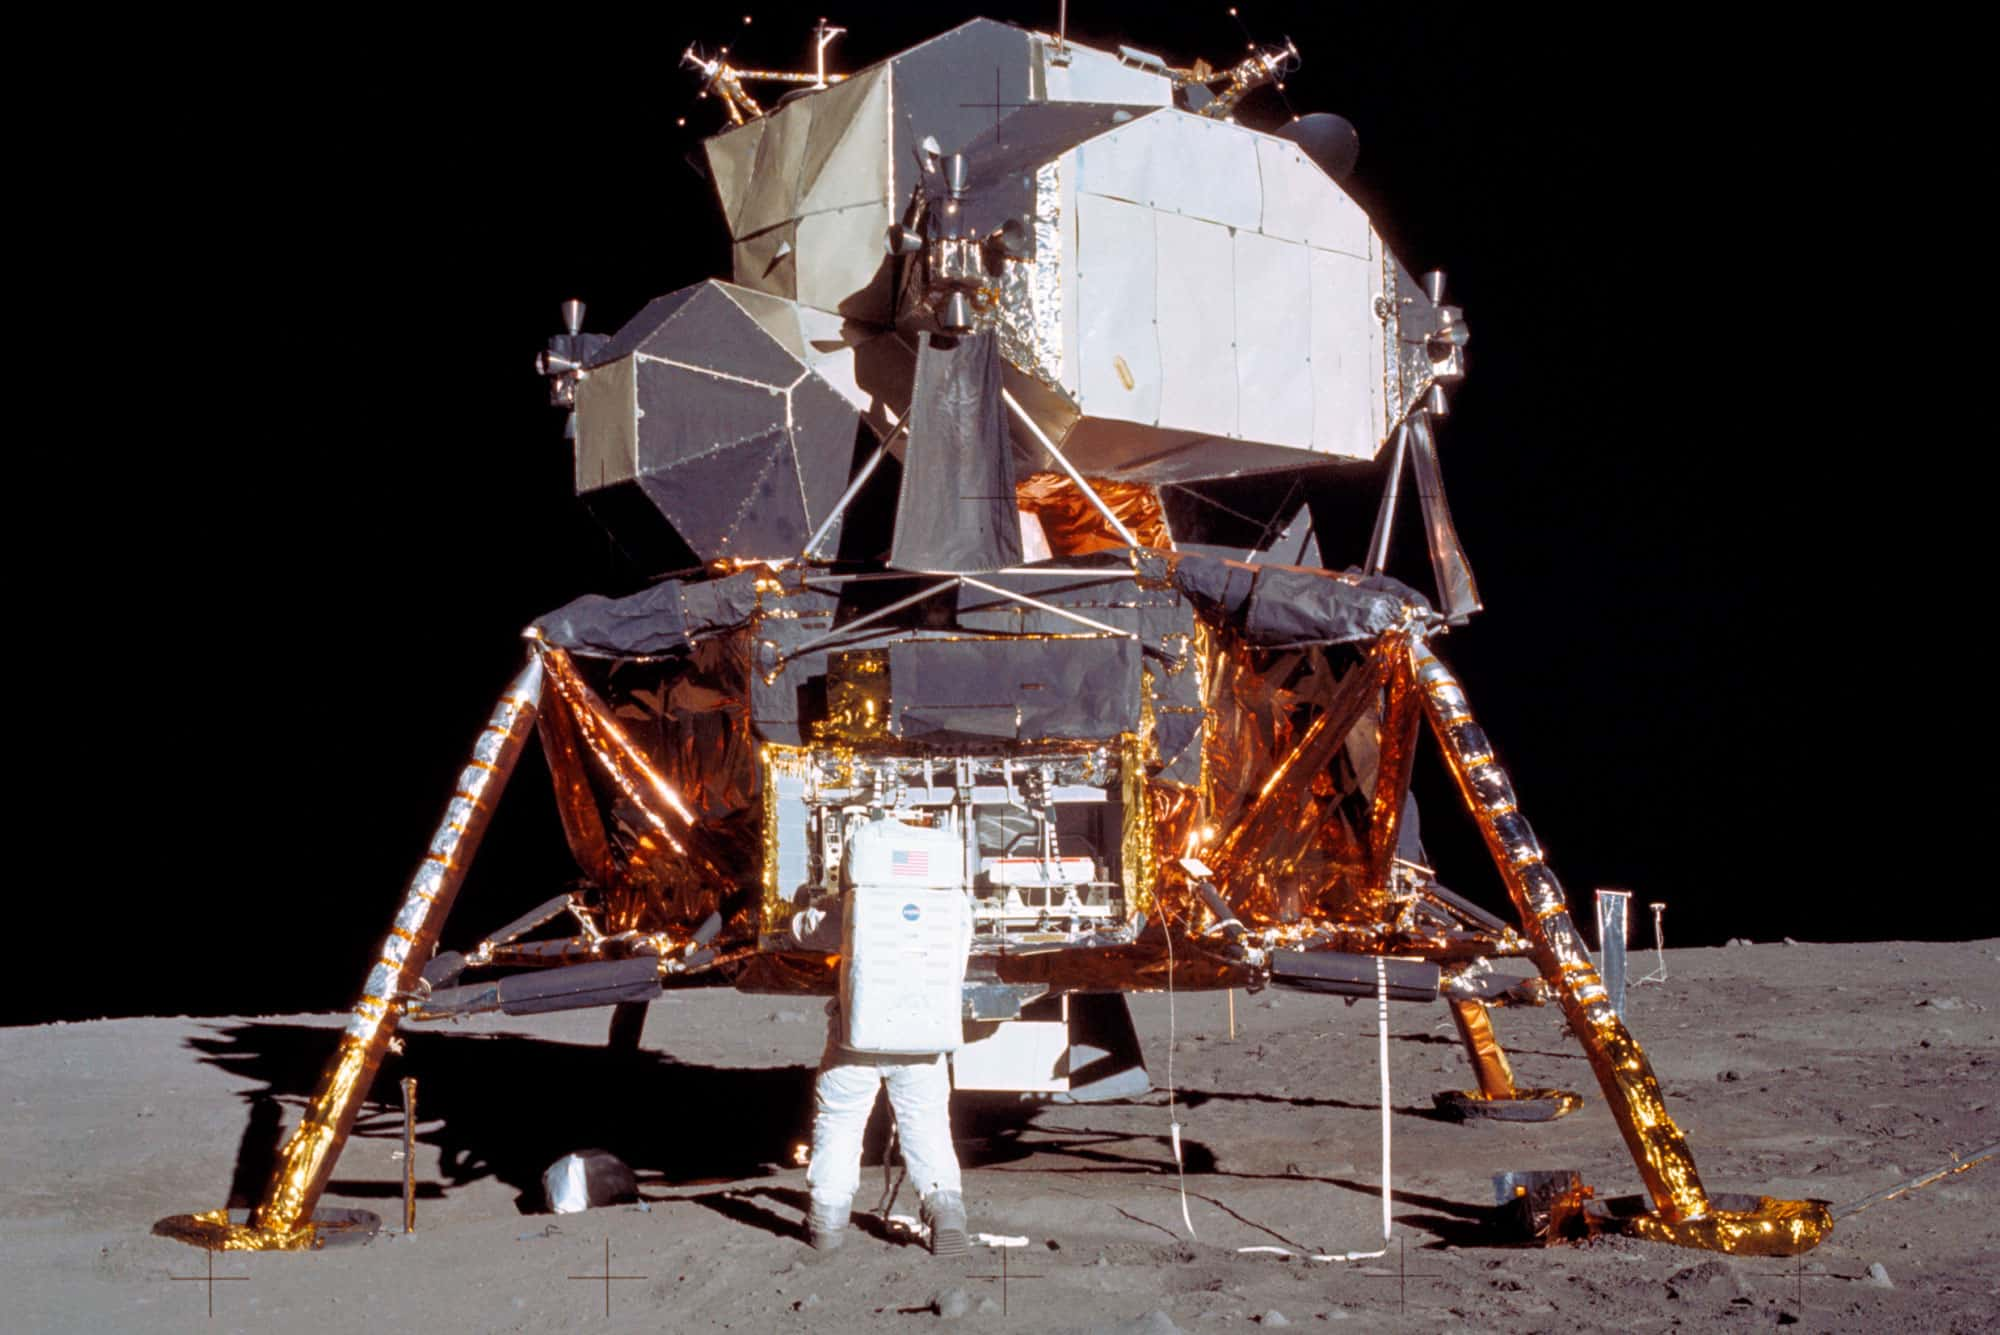 El astronauta Edwin E. Aldrin